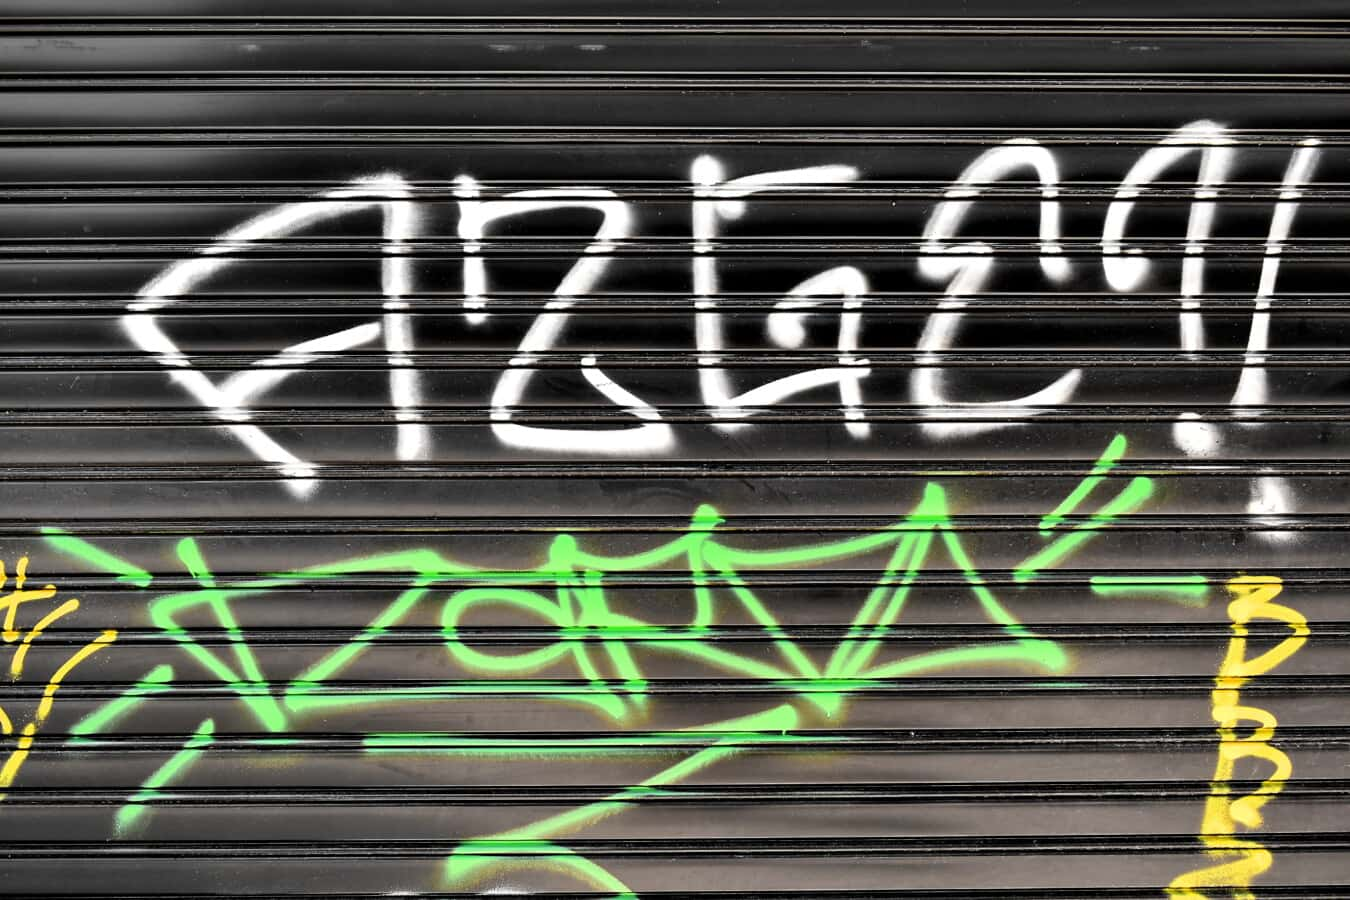 abstract, graffiti, sign, metal, vandalism, urban area, pattern, design, line, art